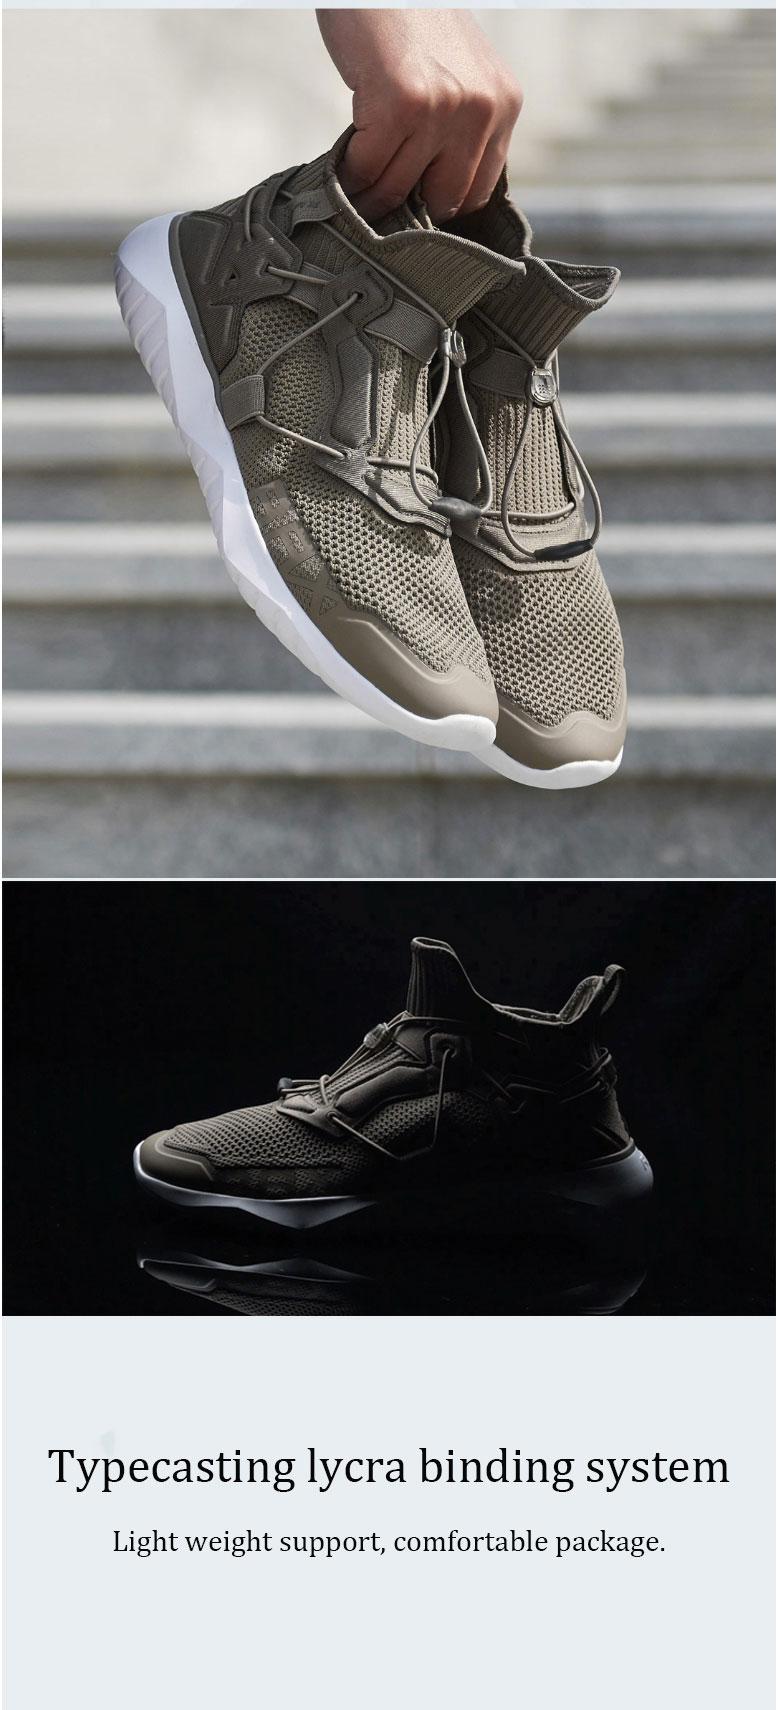 buy xiaomi rax ultralight men sneakers